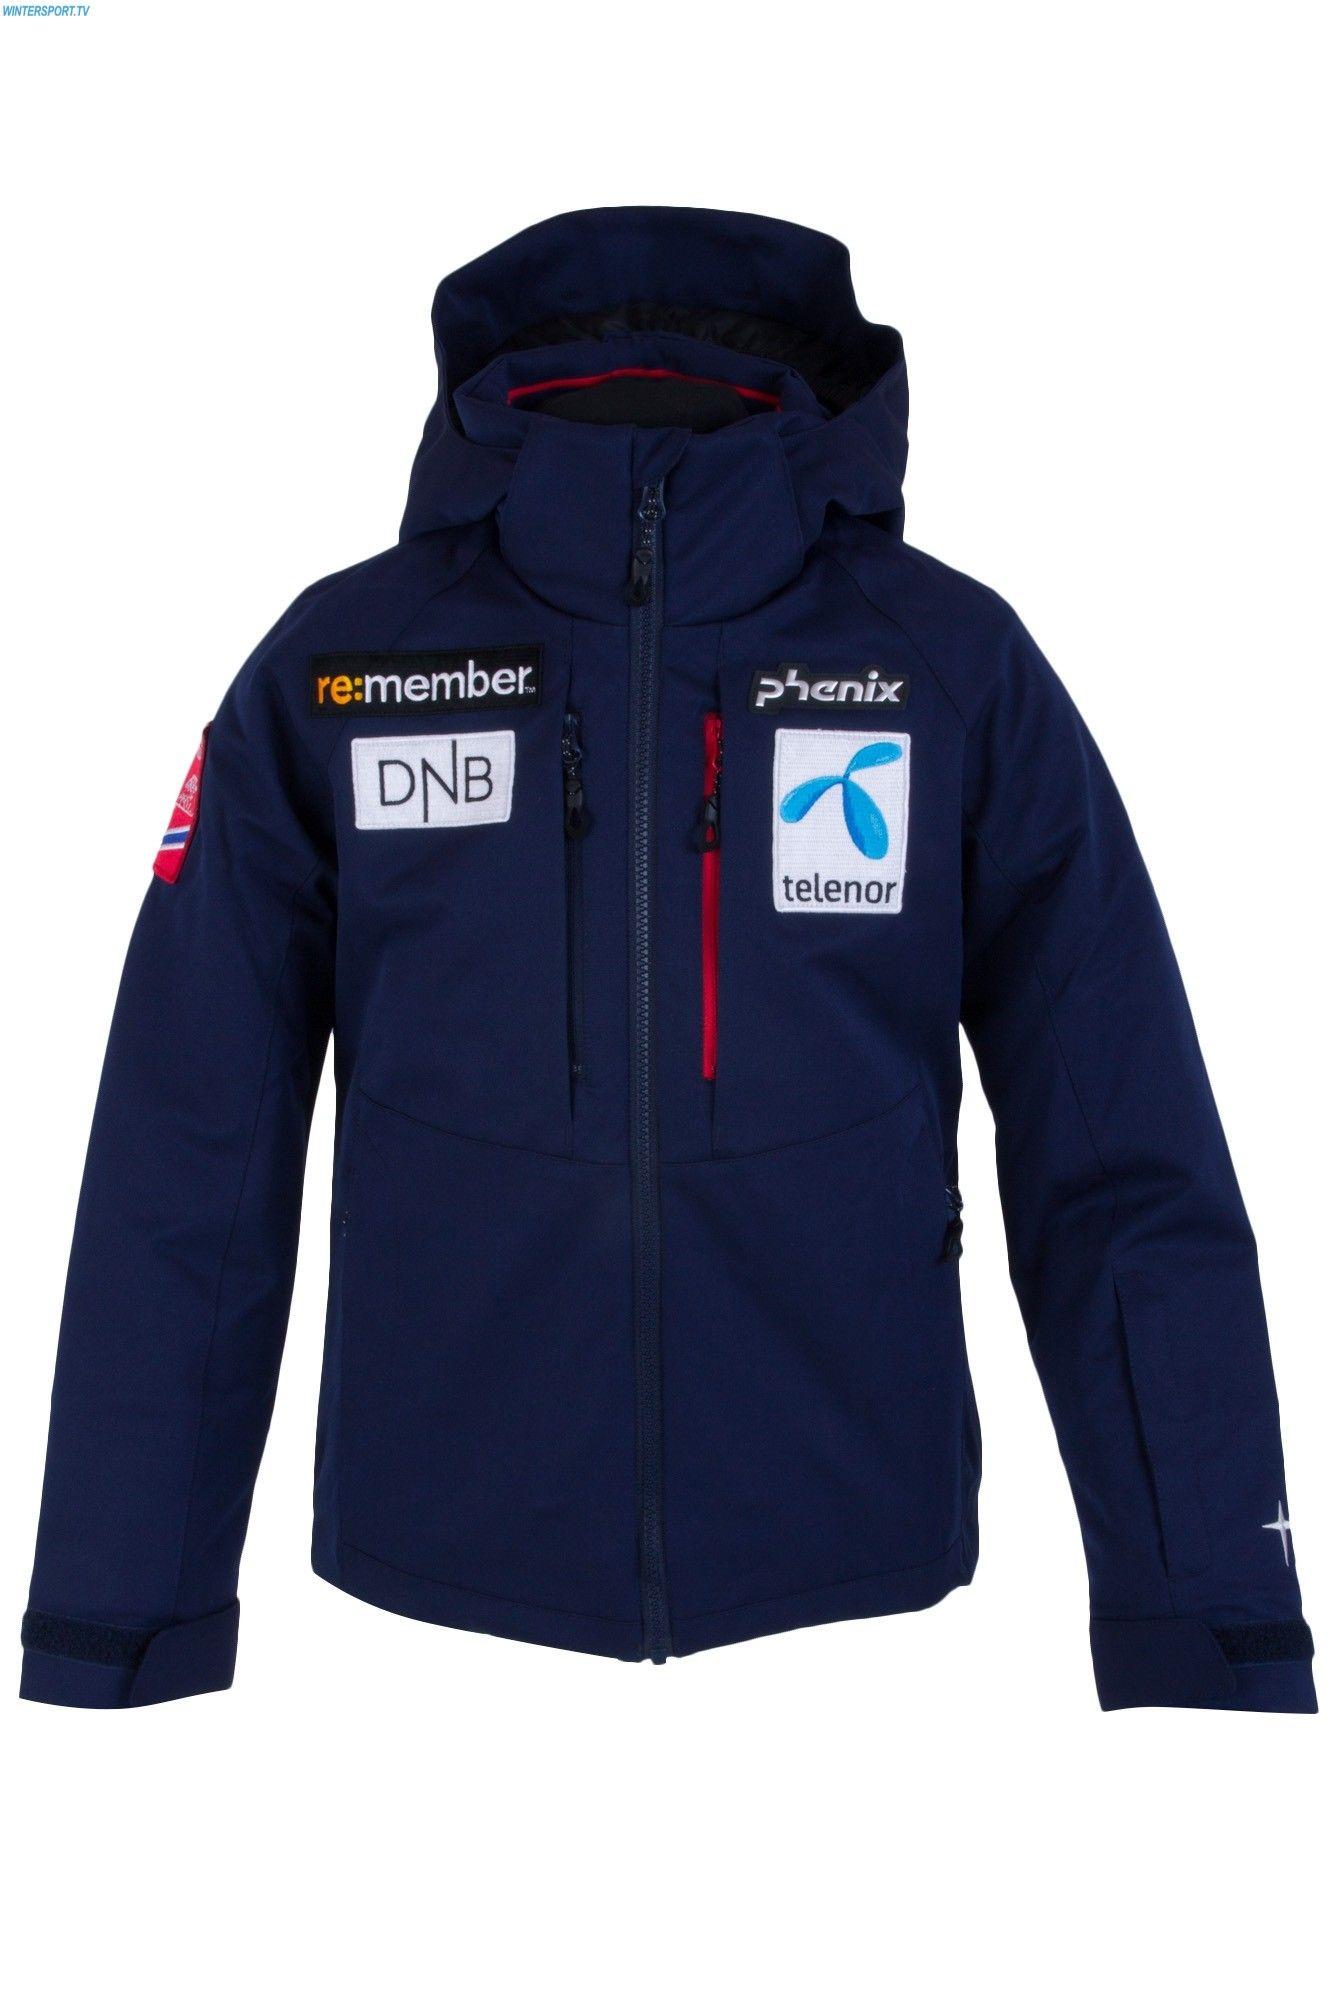 Phenix Kids Norway Alpine Team Jacket Navy Phenix Ski Wear